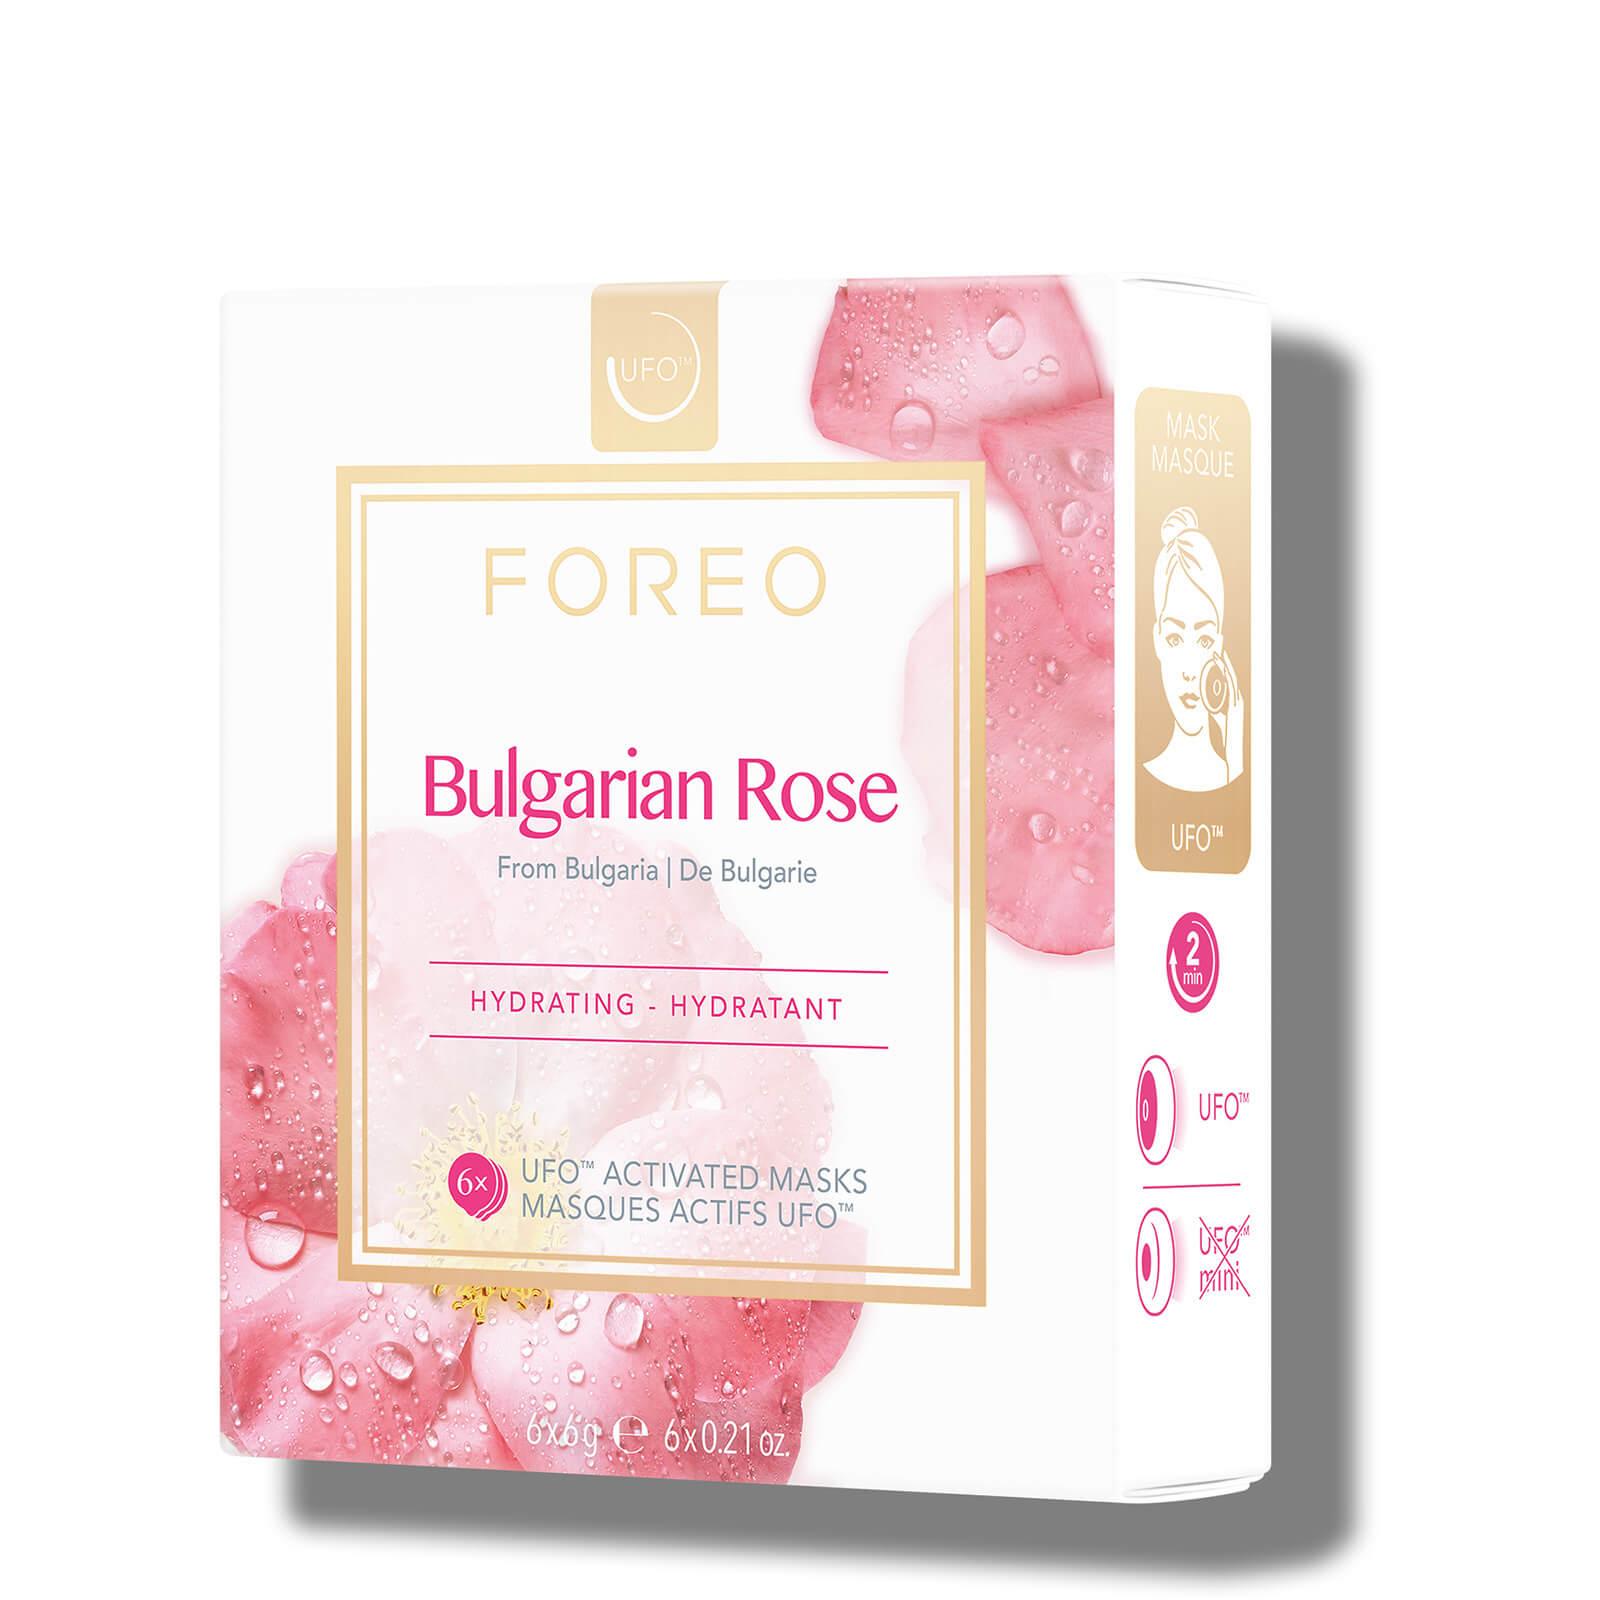 FOREO UFO Bulgarian Rose Moisture-Boosting Face Mask (6 Pack)